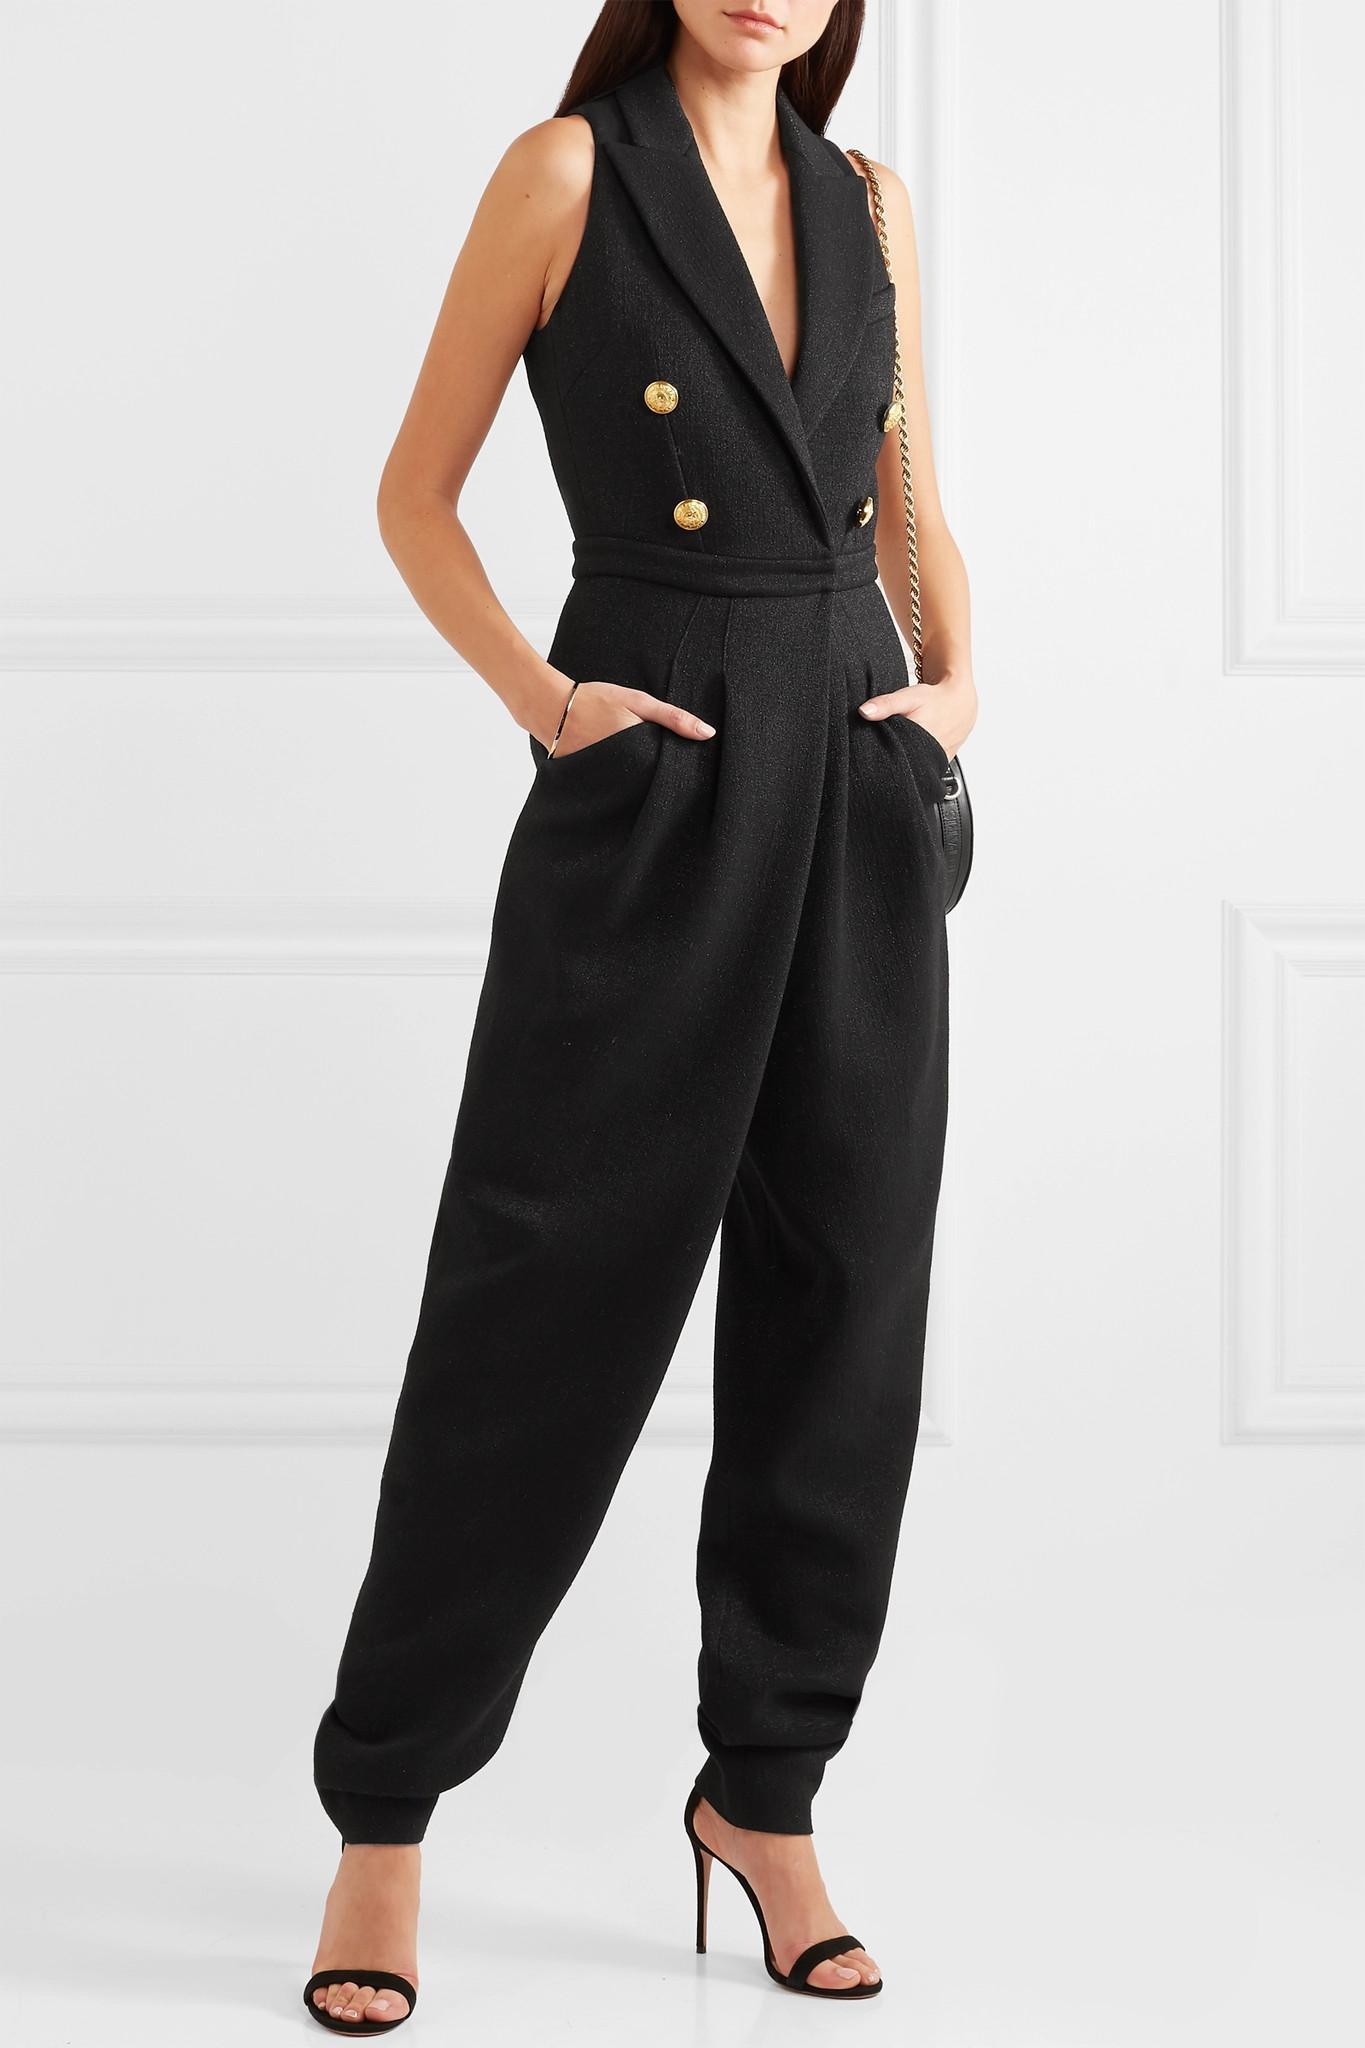 02f5436bac9 Balmain - Black Button-embellished Stretch-knit Jumpsuit - Lyst. View  fullscreen